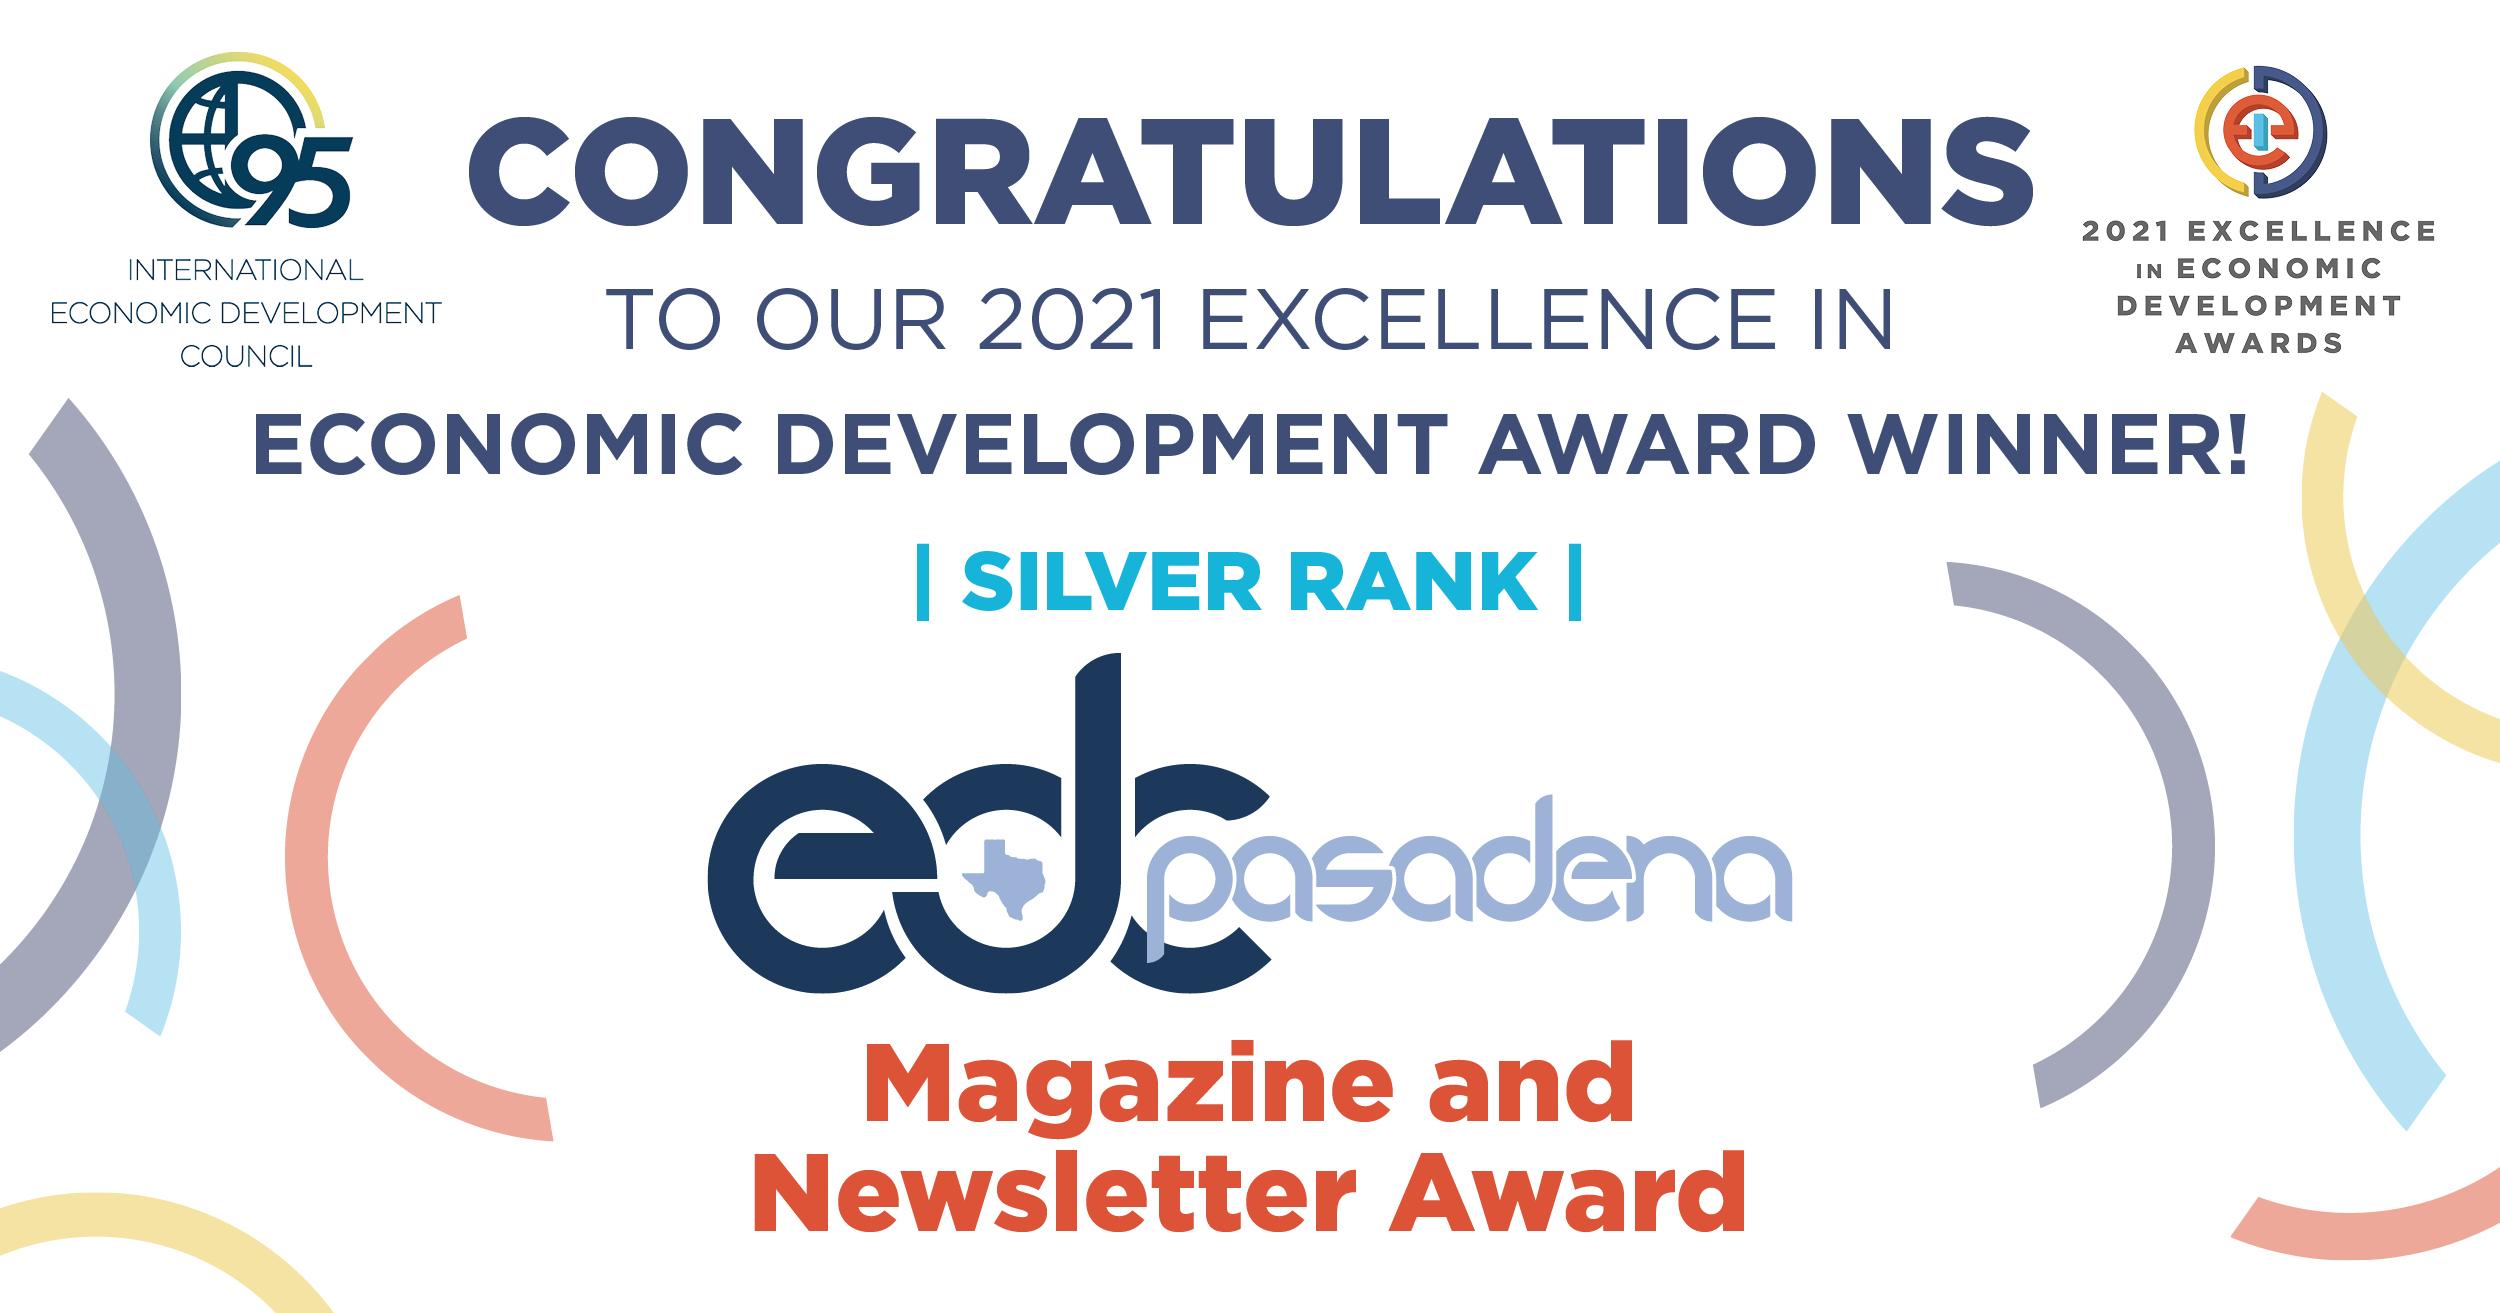 Click the Pasadena Economic Development Corporation Receives Excellence in Economic Development Award from the International Economic Development Council Slide Photo to Open